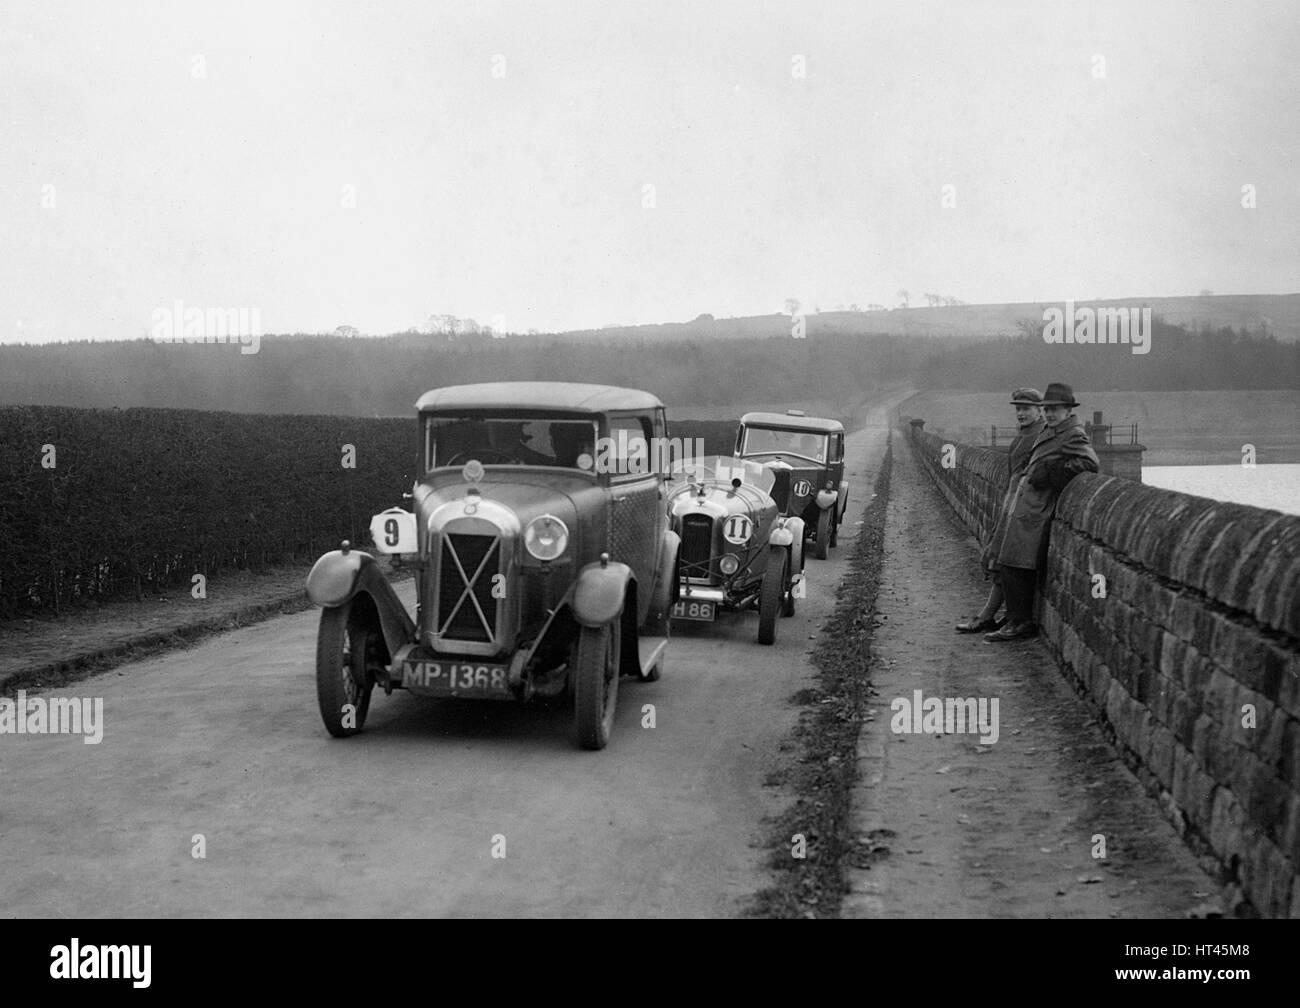 Salmson, Amilcar and Riley 9, Ilkley & District MC Trial, Fewston Reservoir, Yorkshire, 1930s. Artist: Bill - Stock Image